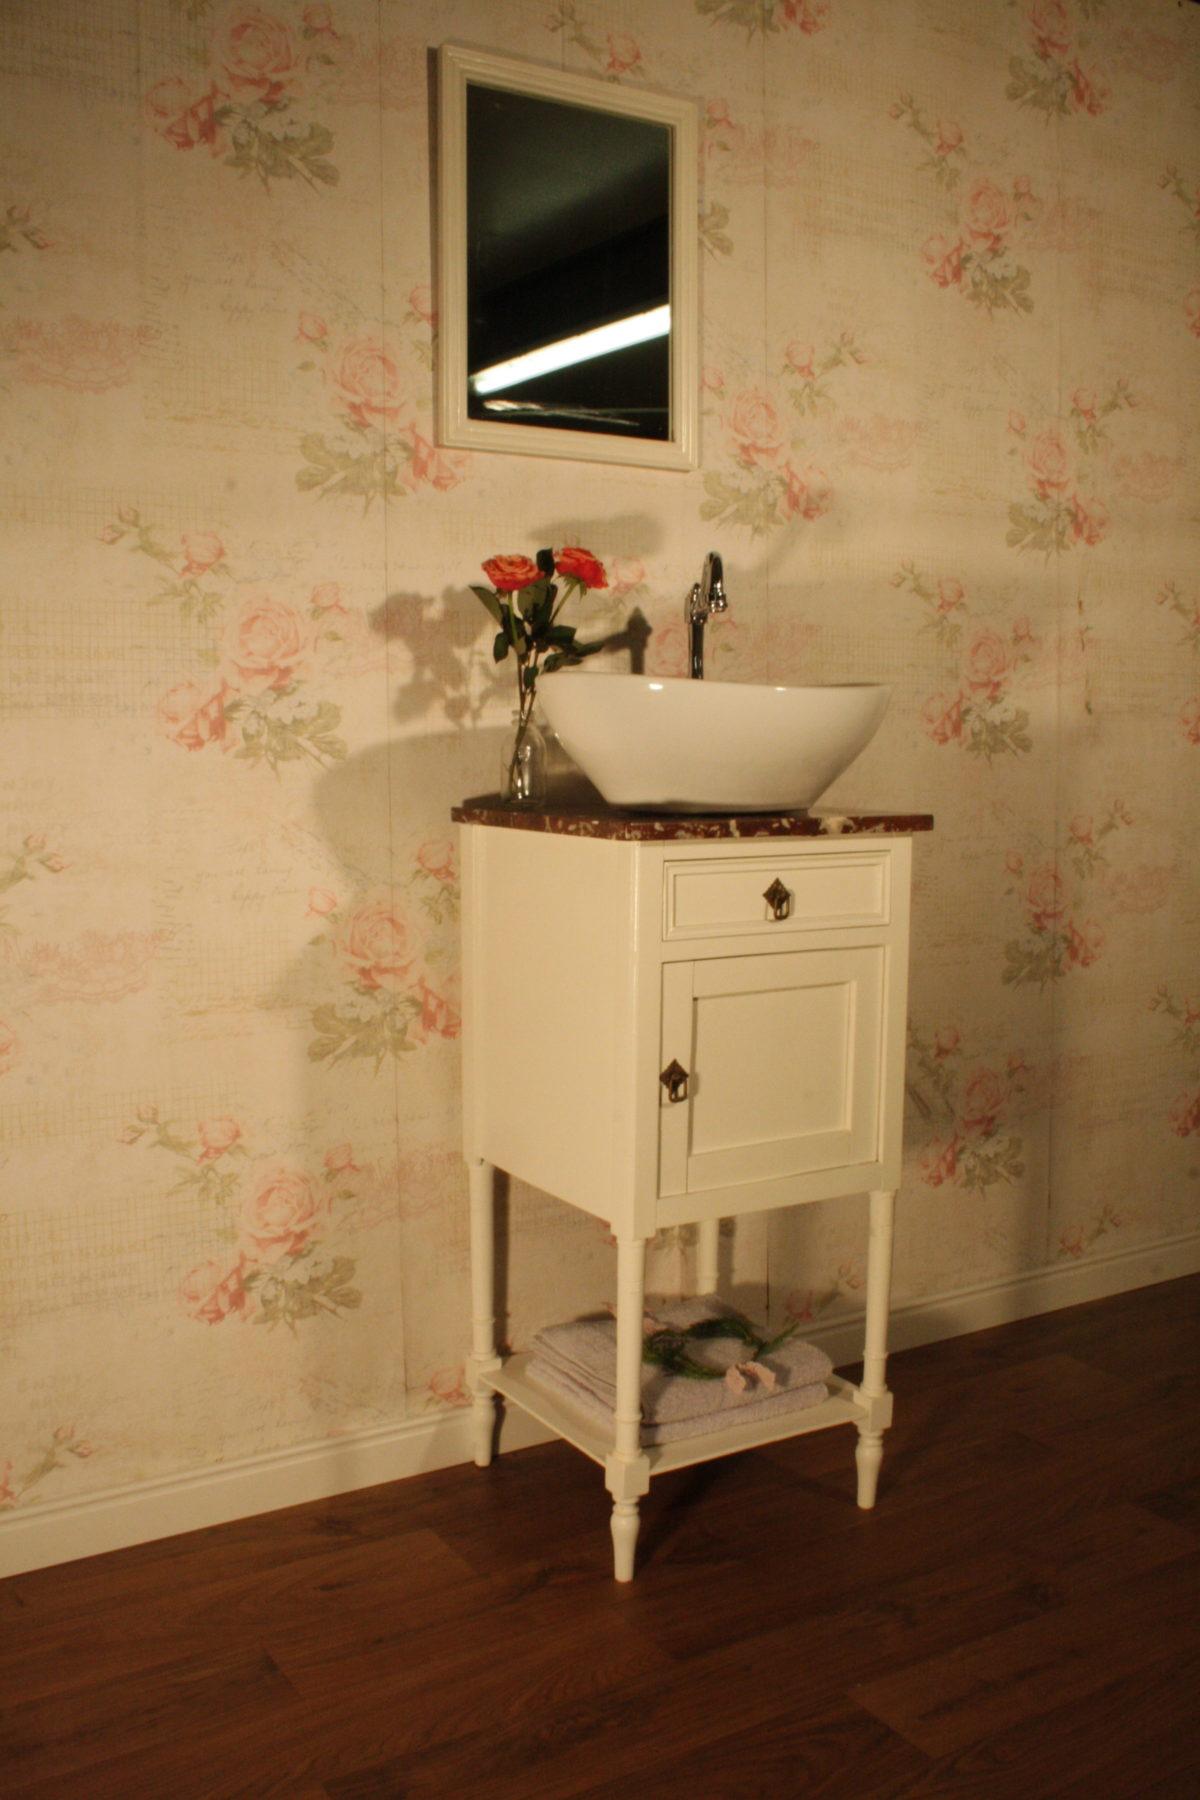 landhaus badm bel bringen nostalgischen flair ins bad. Black Bedroom Furniture Sets. Home Design Ideas